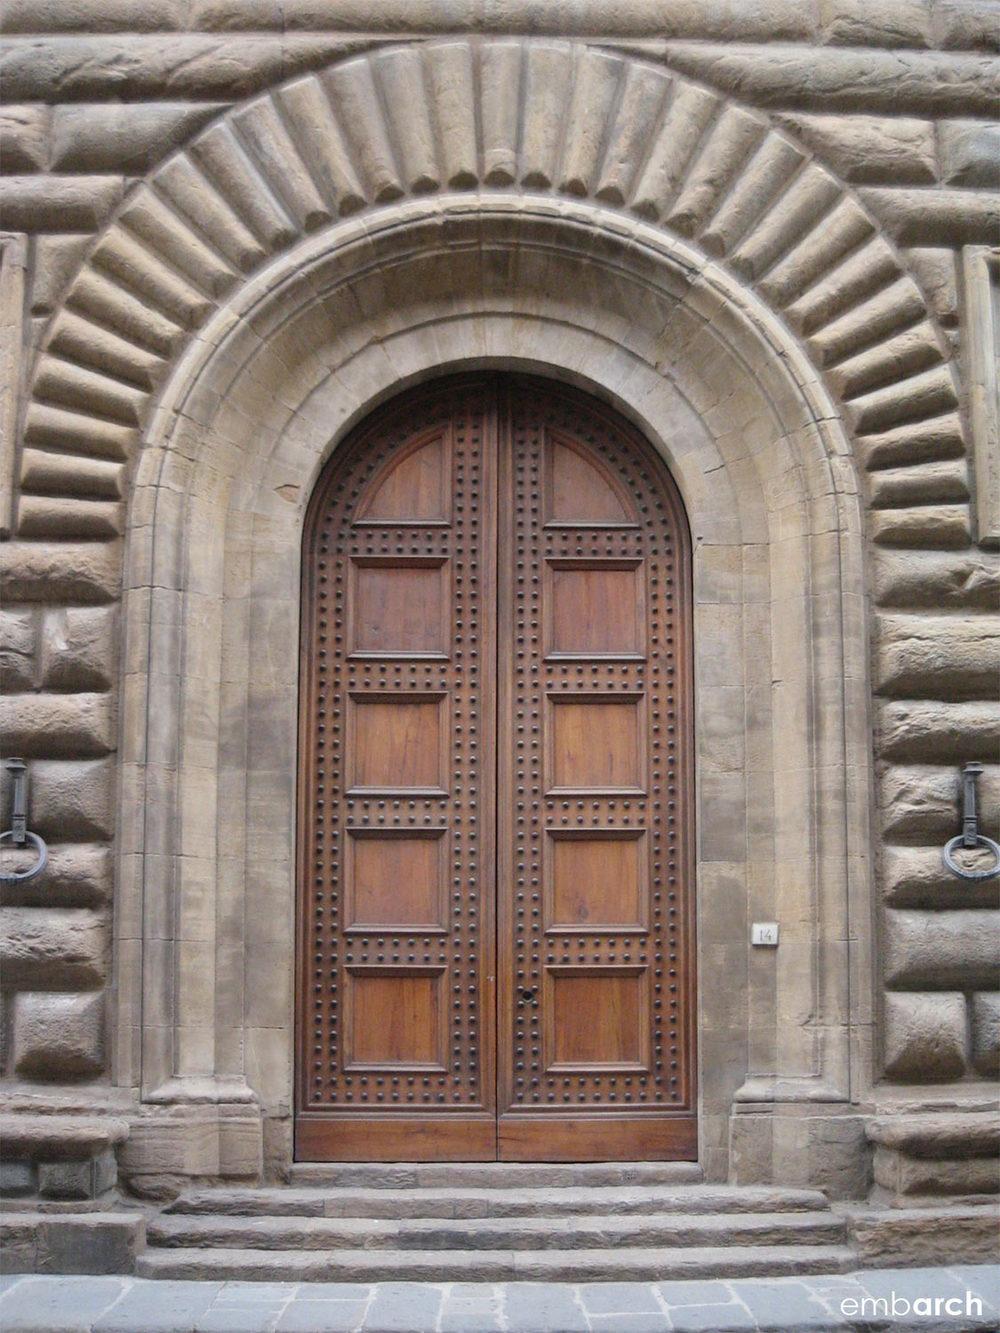 Palazzo Strozzi - exterior detail